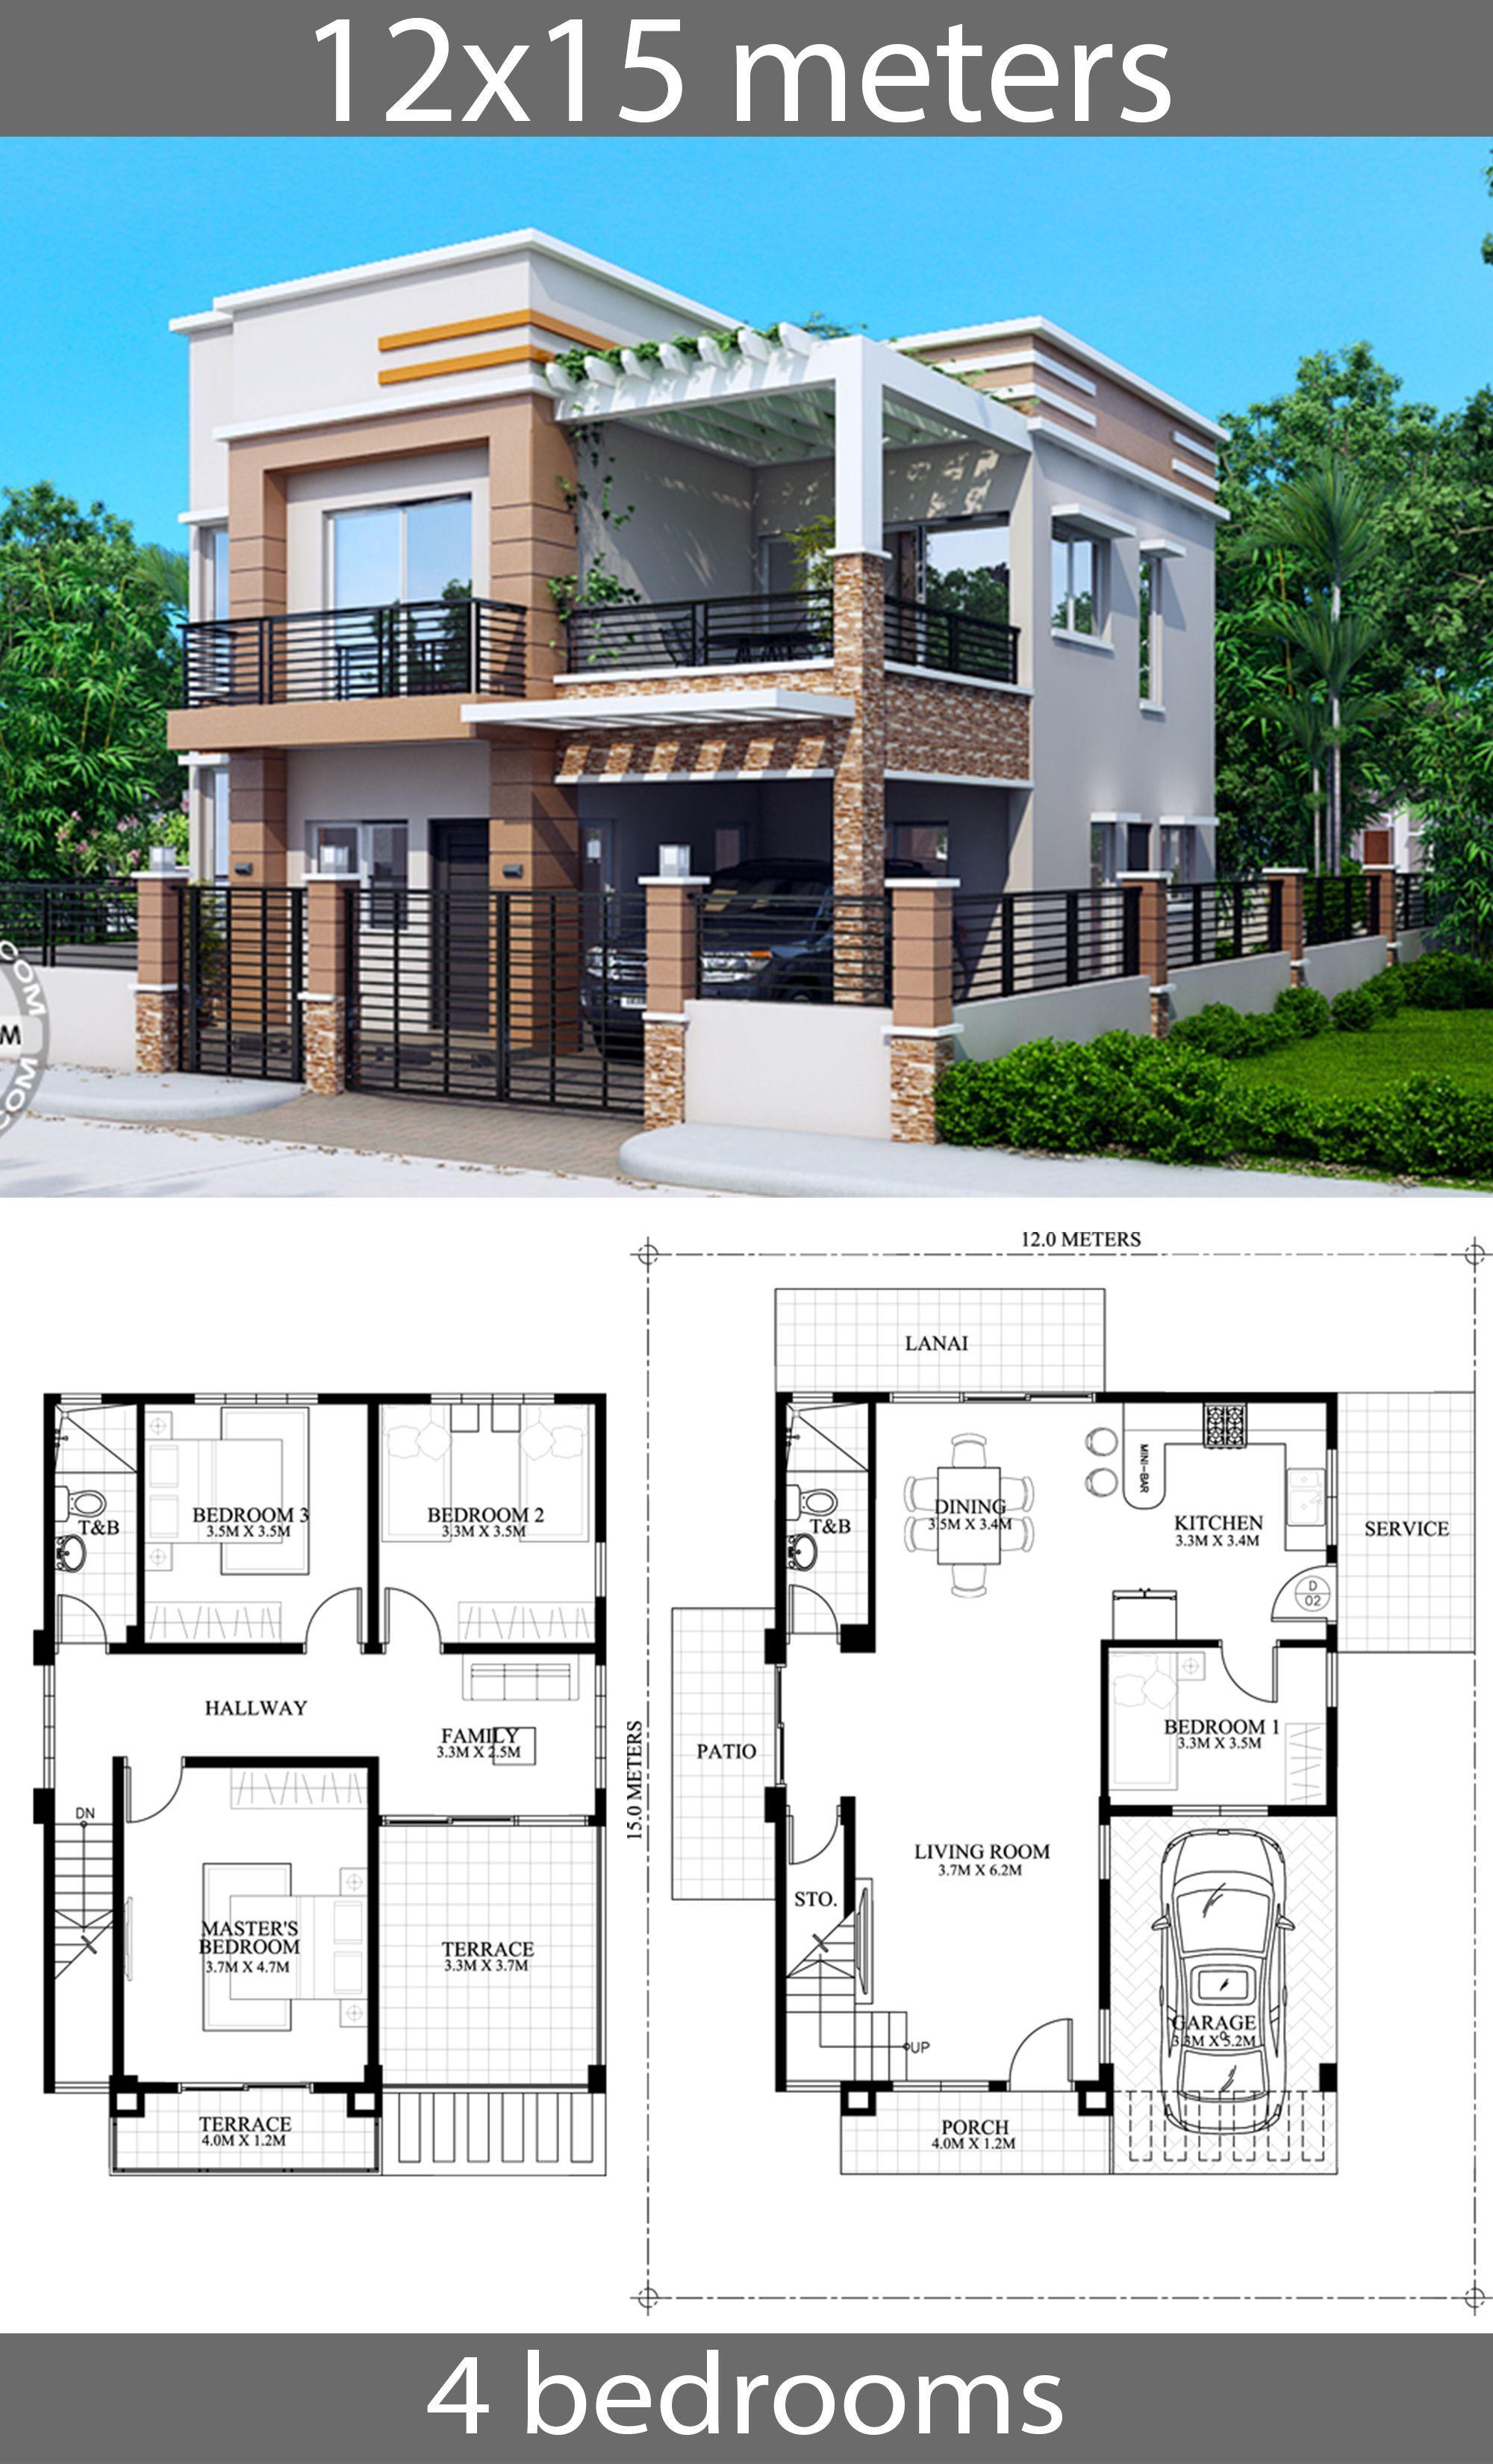 Interiordesignlivingroomwarm Interiordesignlivingroommodern Interiordesignlivingroom Interiorde House Construction Plan Sims House Plans Family House Plans